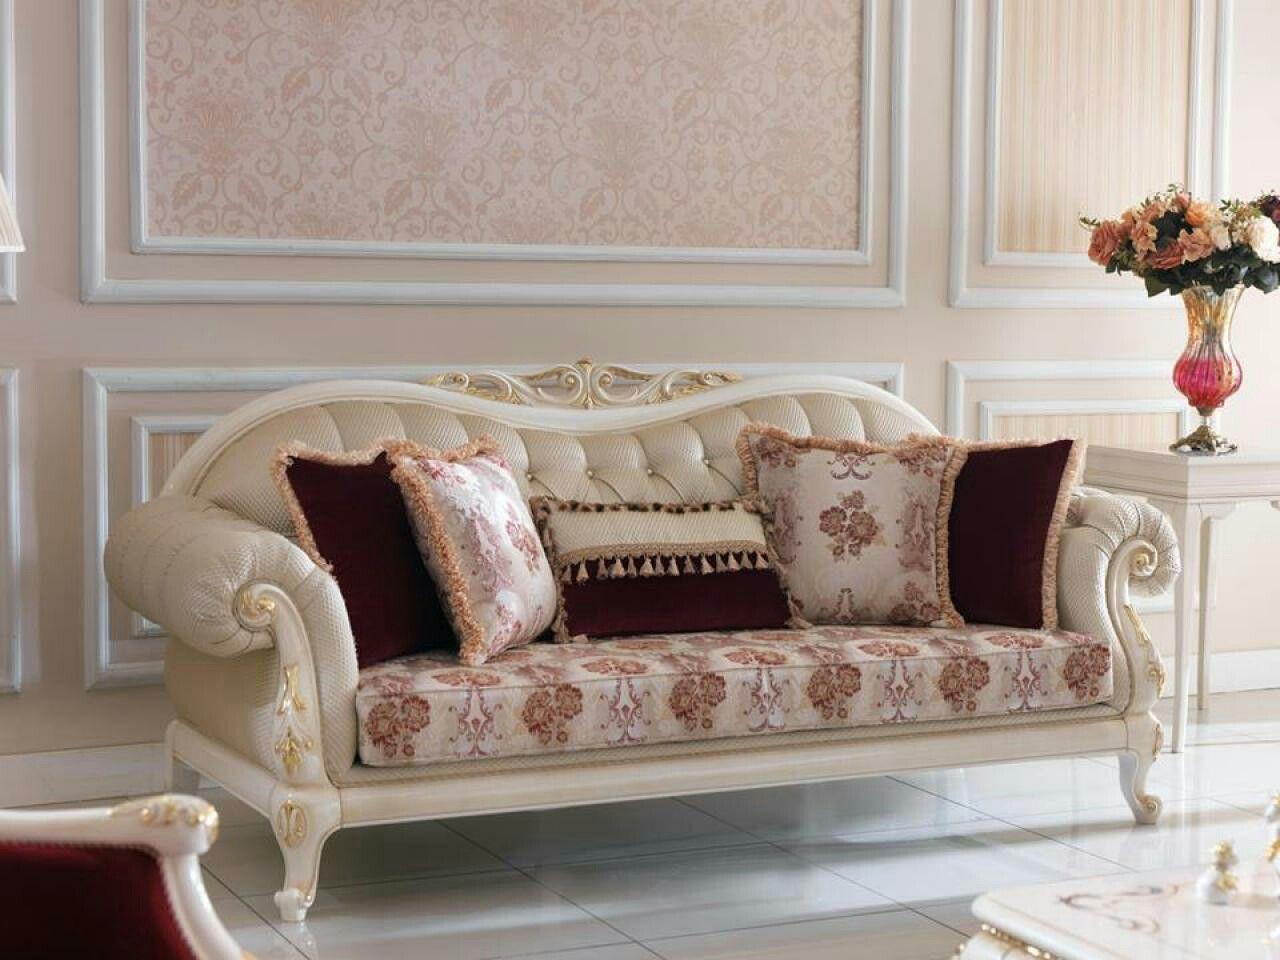 Pin By Gulali Uslu On Koltuk Takimlari Royal Furniture Furniture Decor